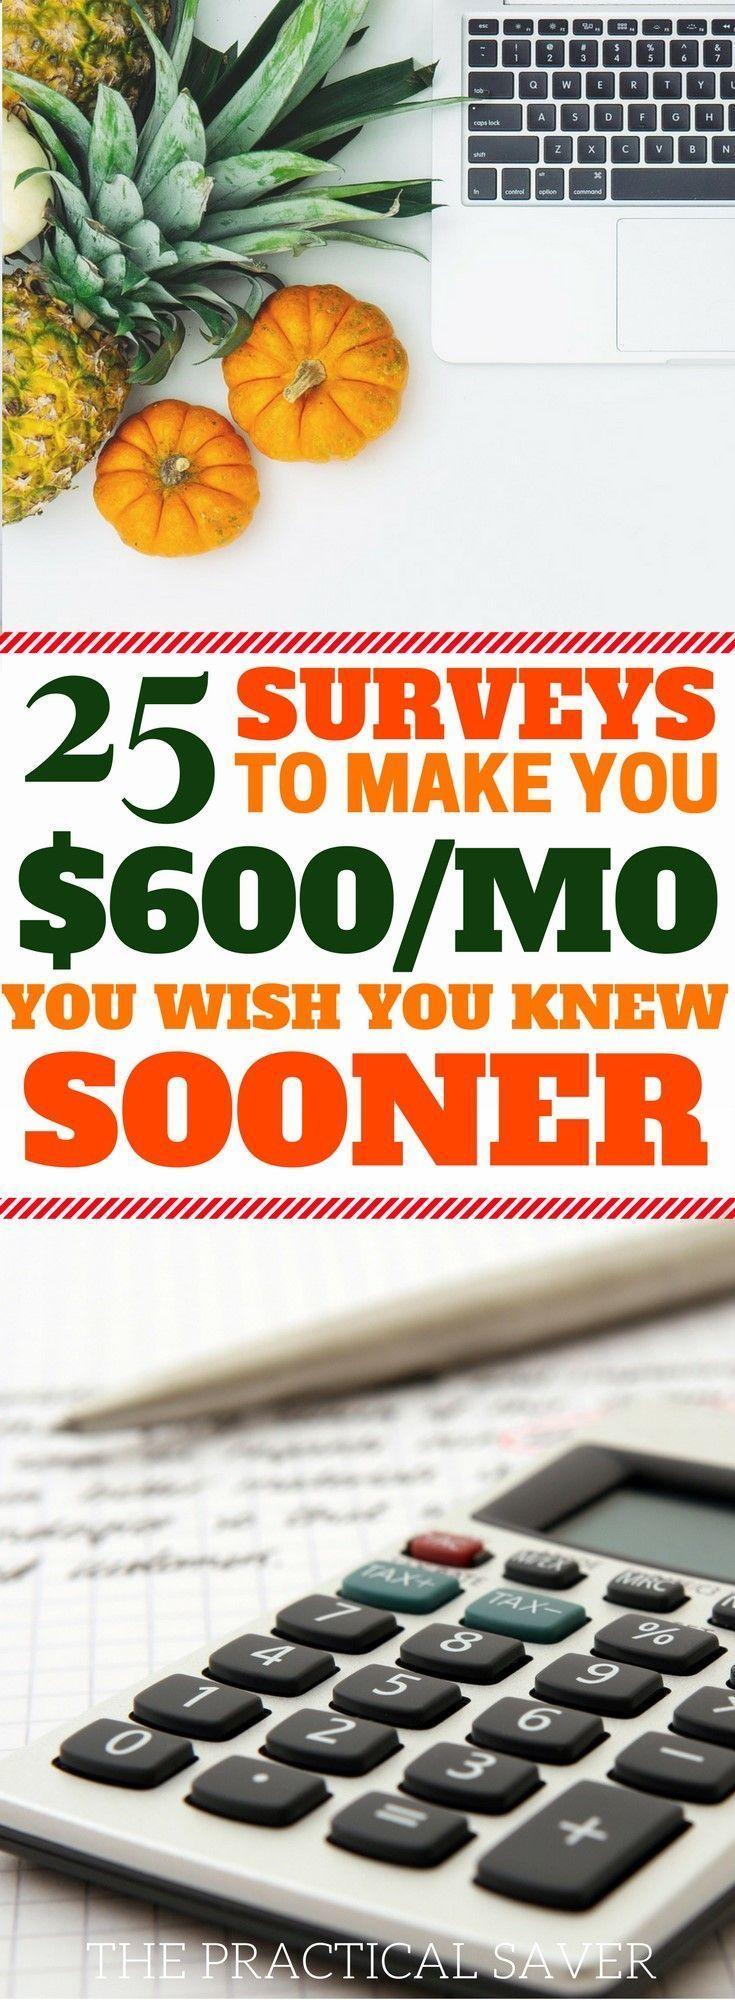 survey sites l passive income ideas l side hustles l work from home